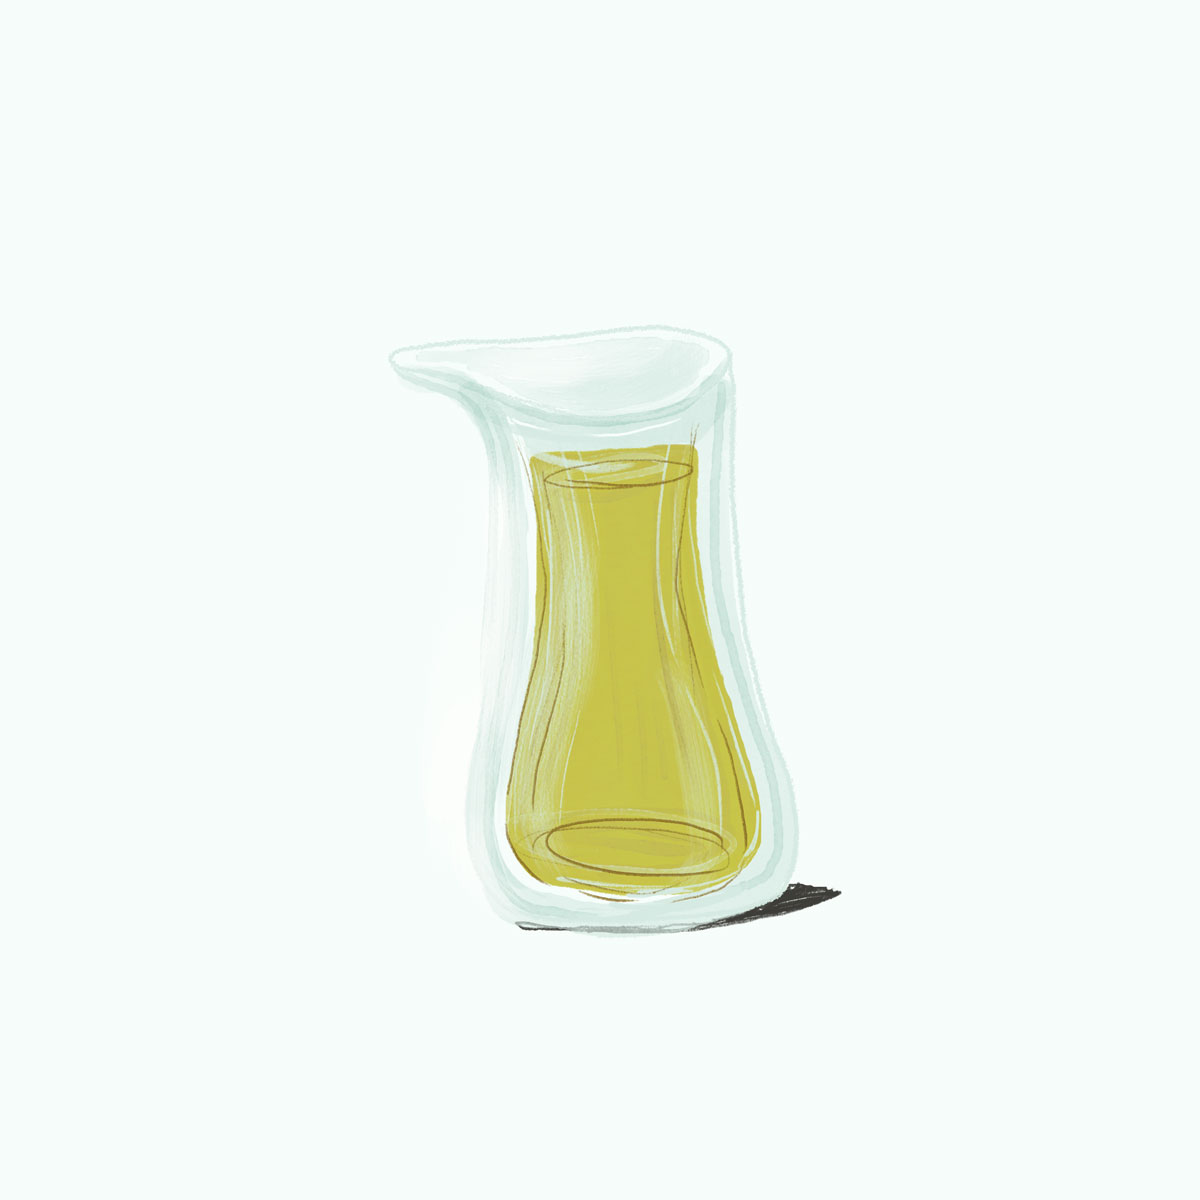 042-Olive-oil.jpg